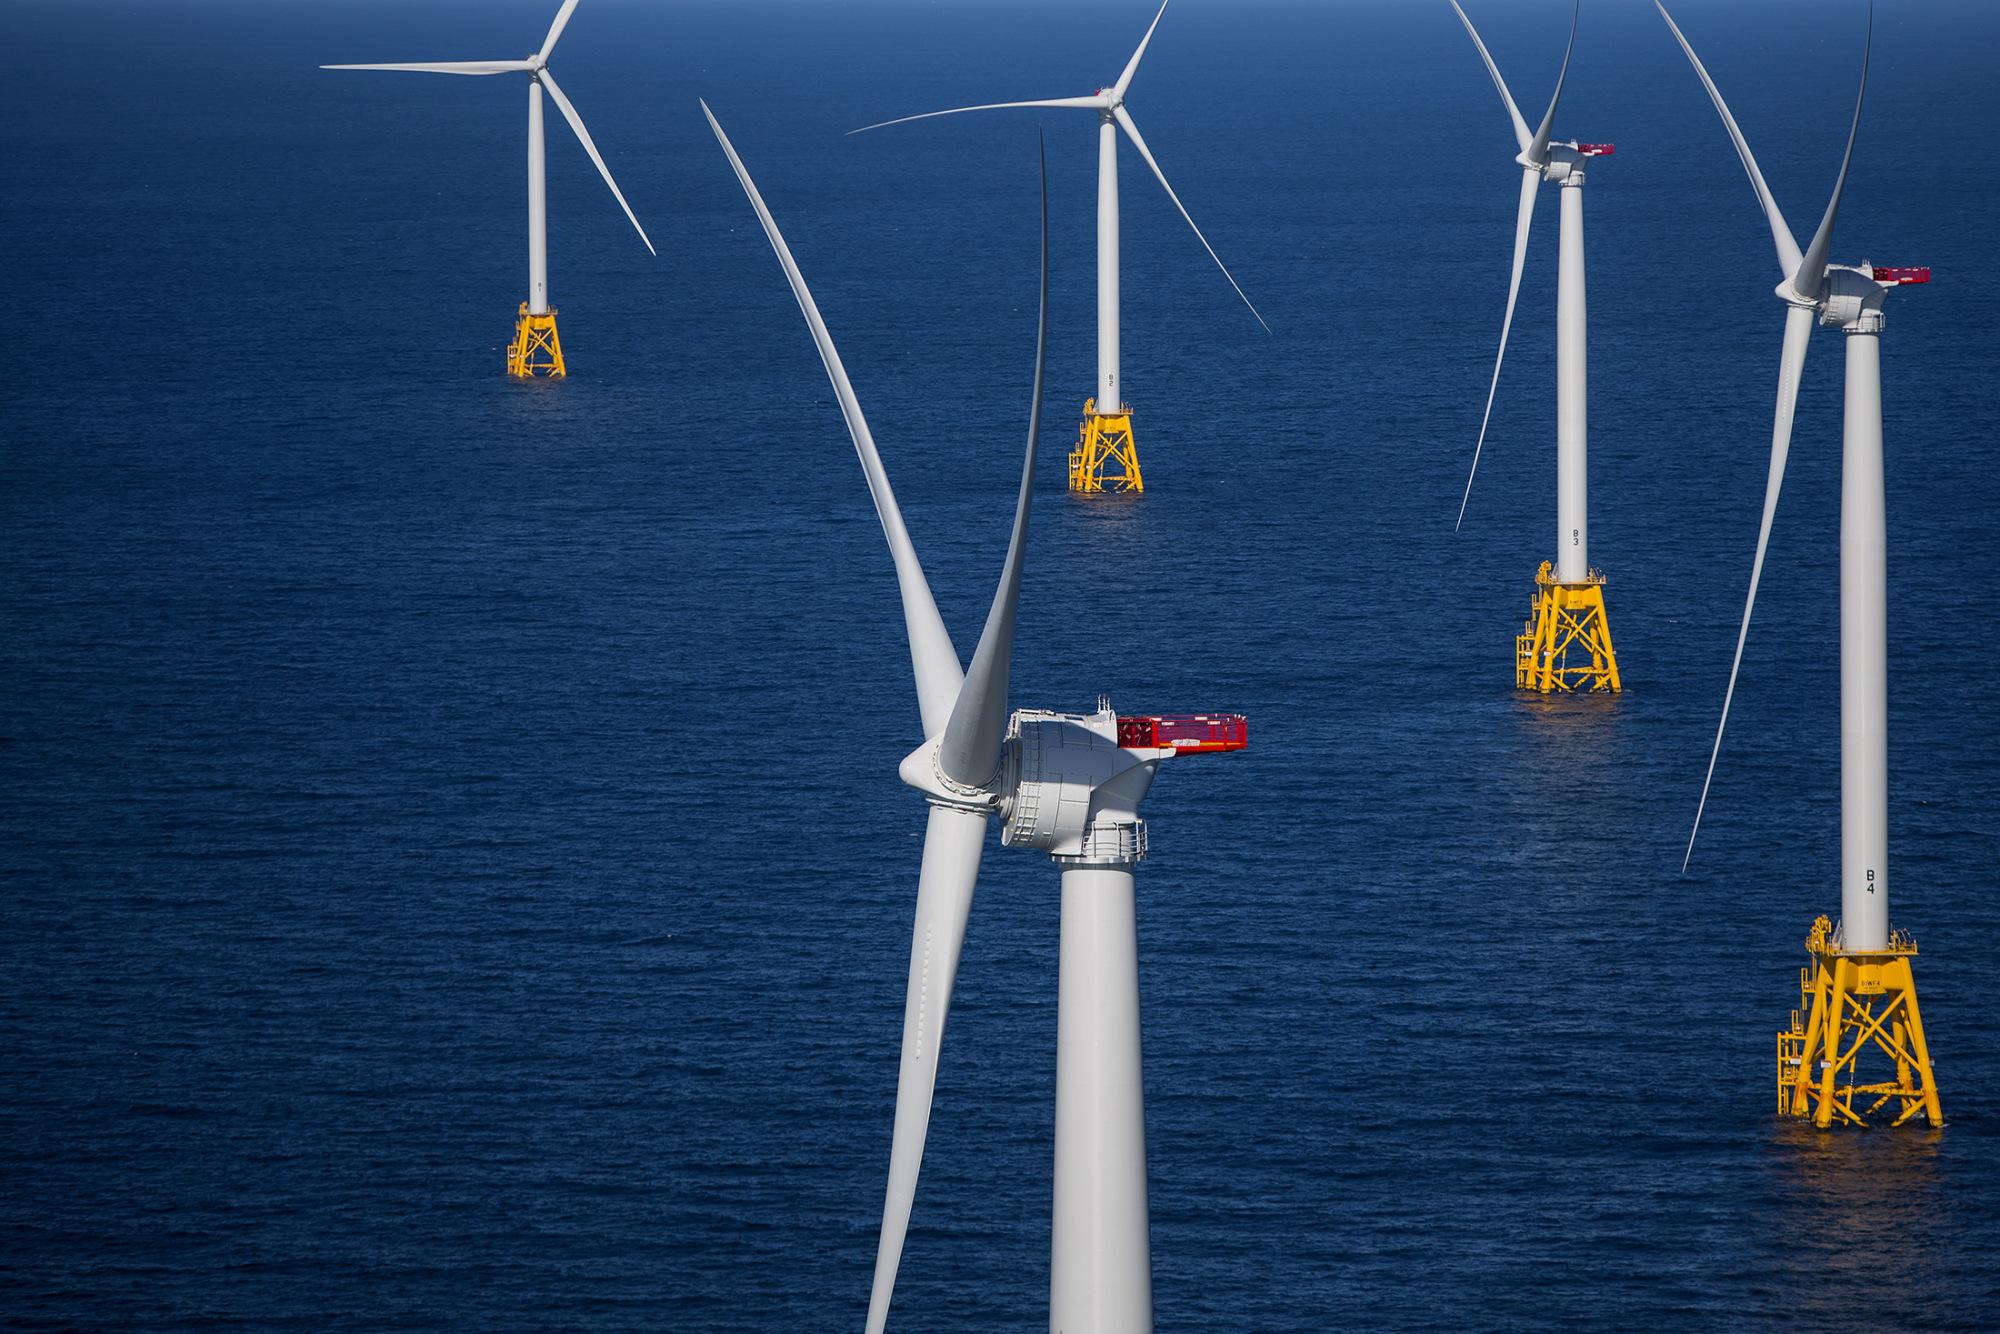 Gigantic Wind Turbines Signal Era of Subsidy Free Green Power